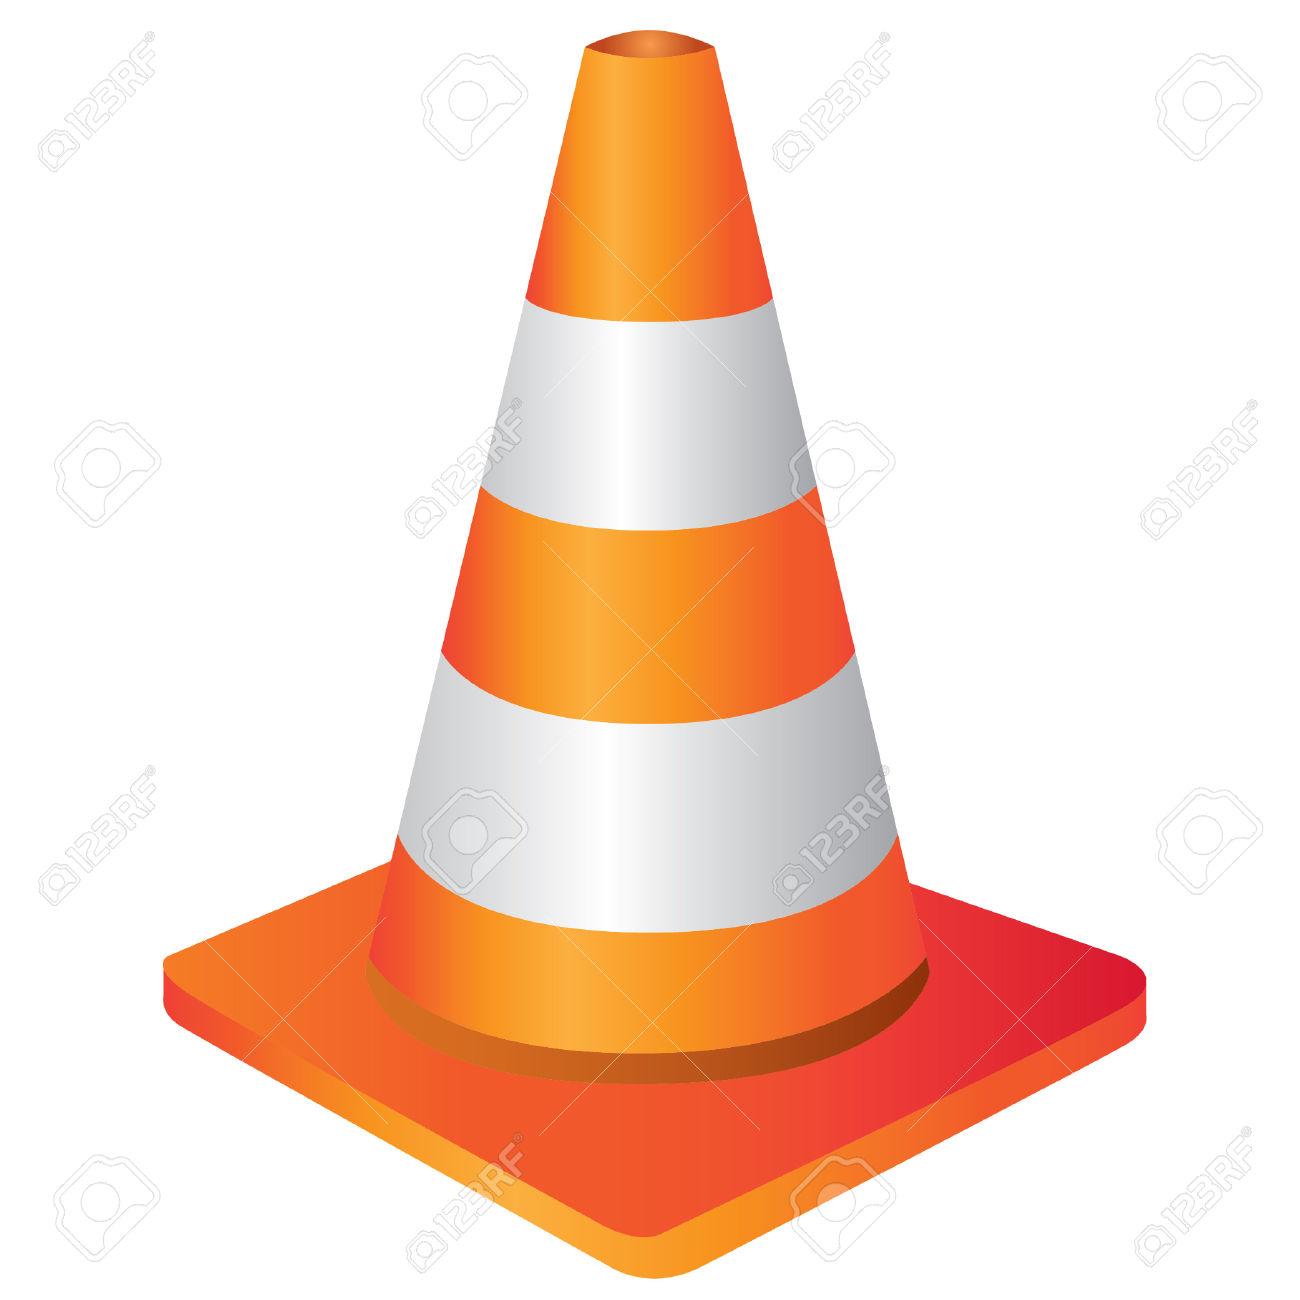 1300x1300 Cone Clipart Construction Border